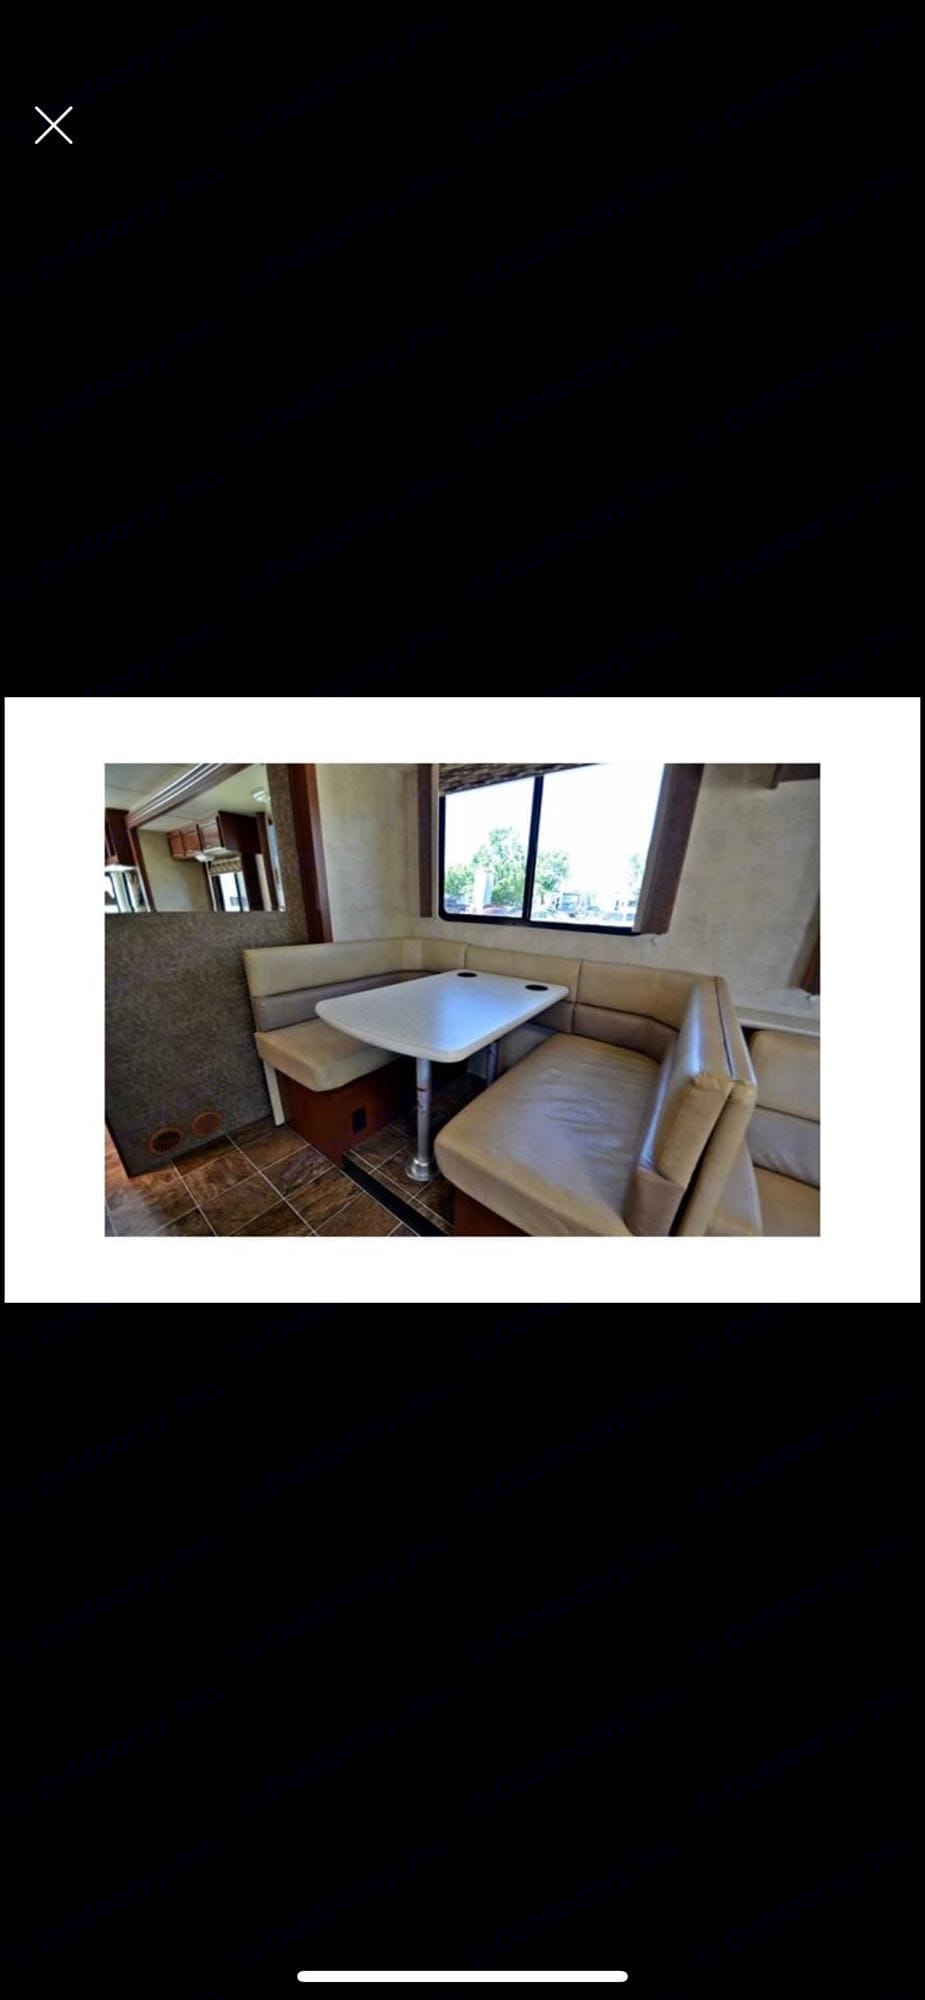 convertible dinette table. Thor Motor Coach A.C.E 2013